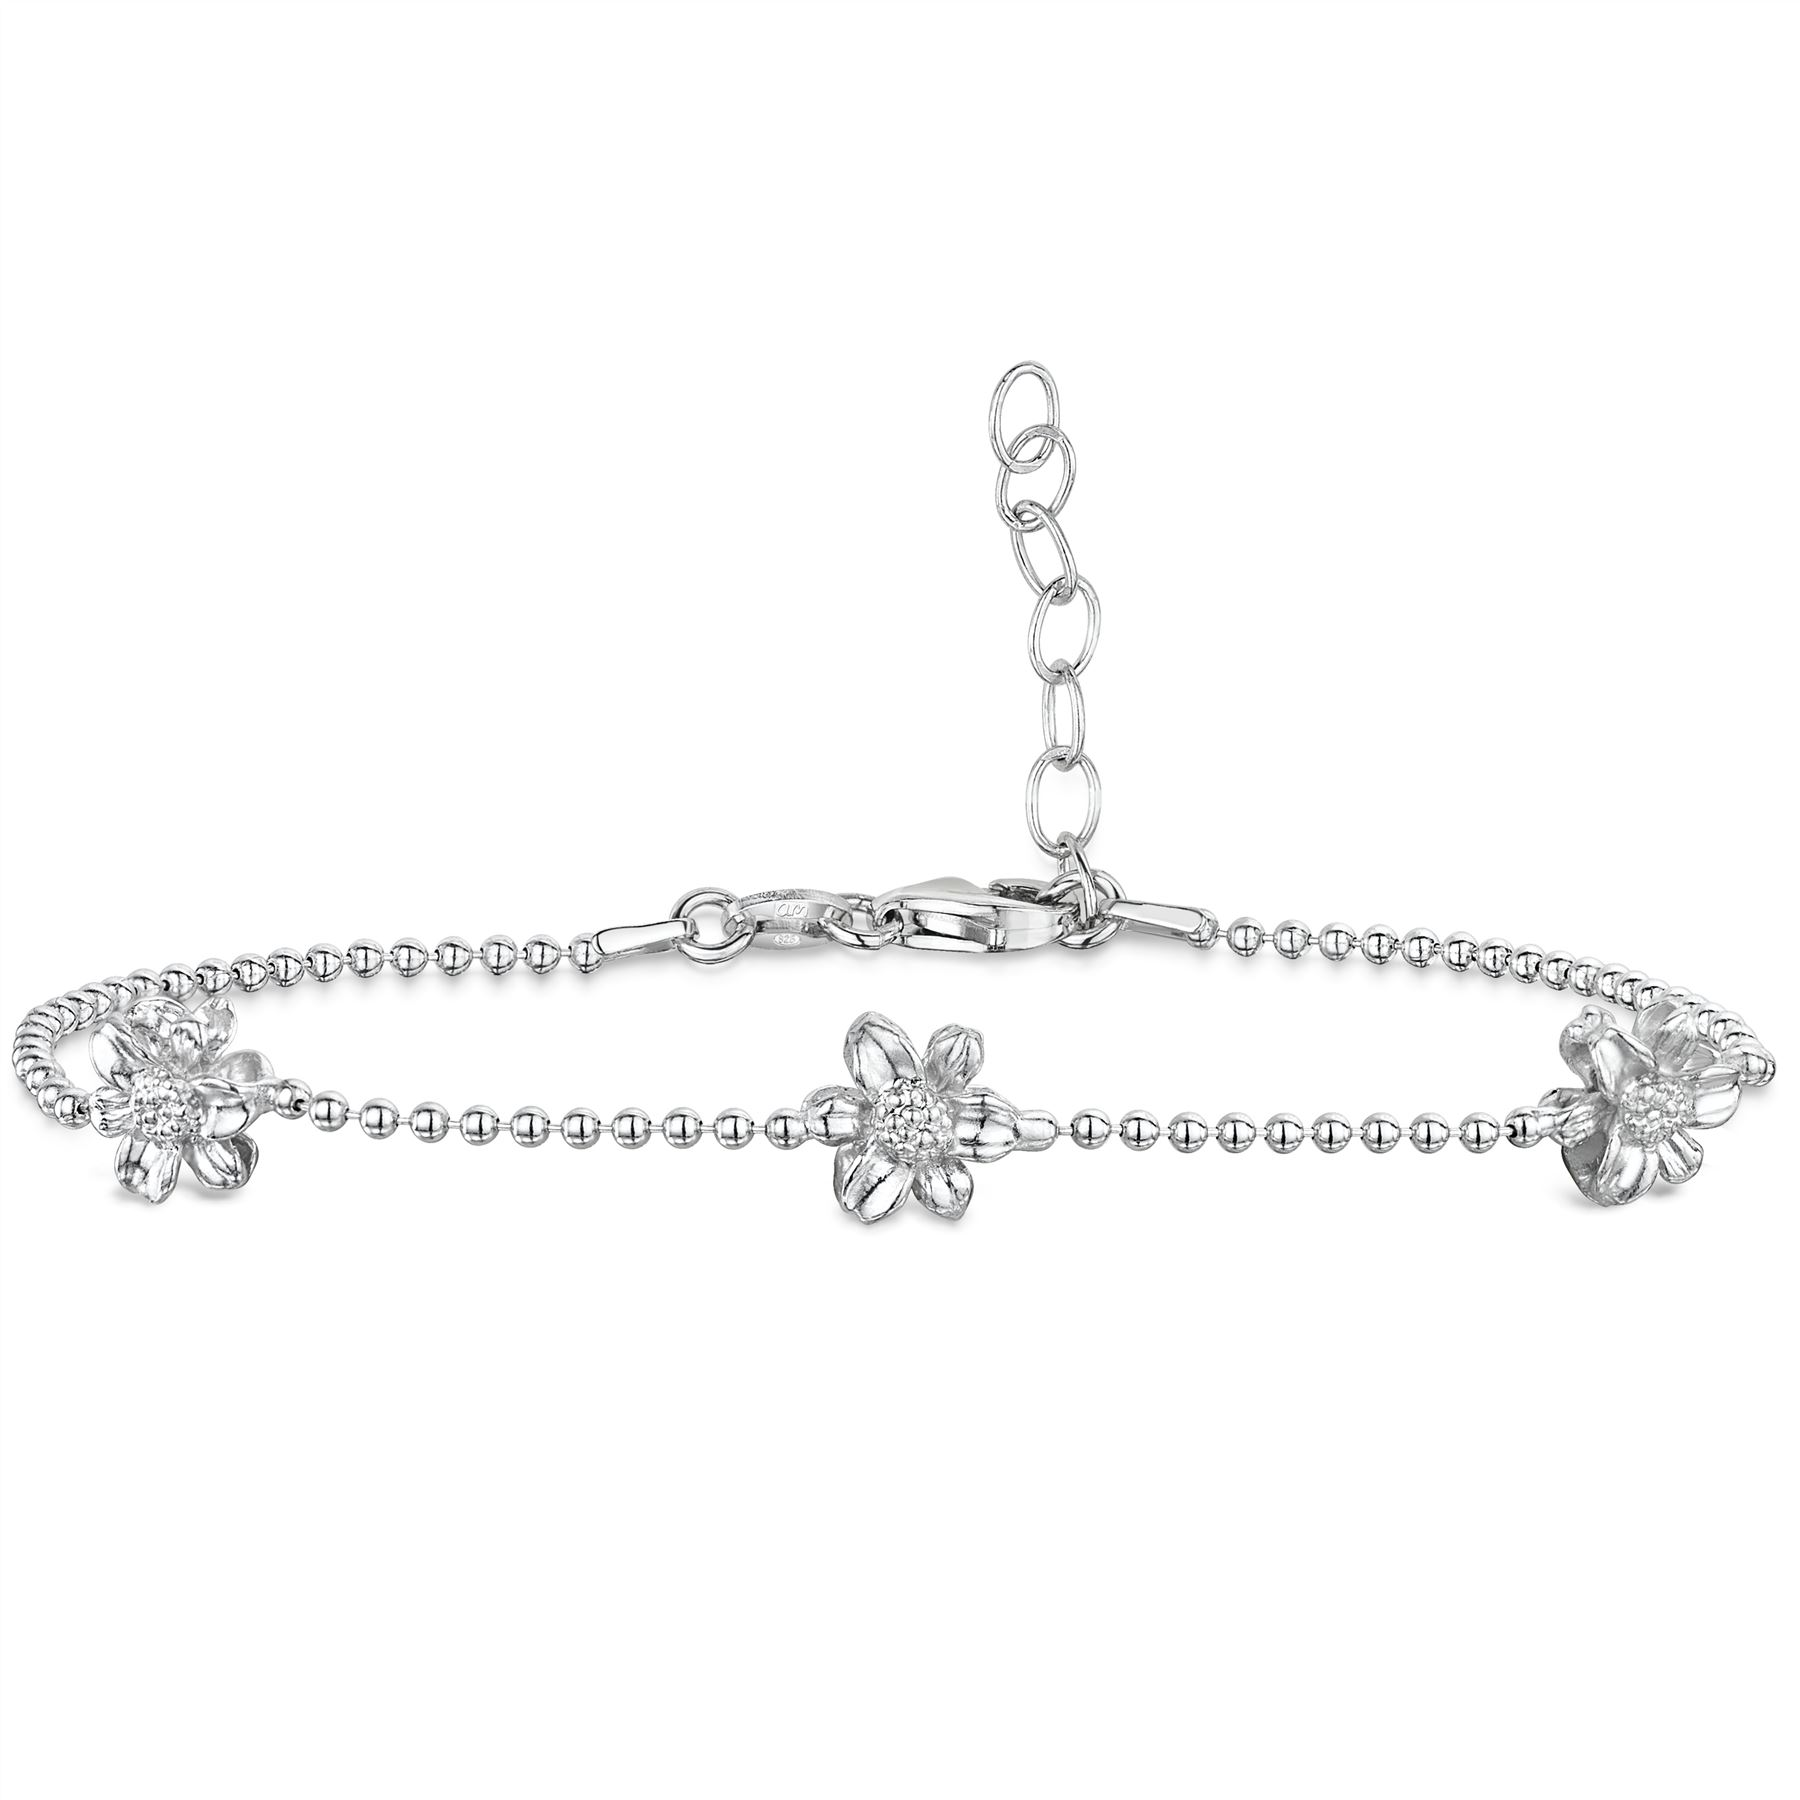 Amberta-Jewelry-925-Sterling-Silver-Adjustable-Bracelet-Italian-Bangle-for-Women miniature 45